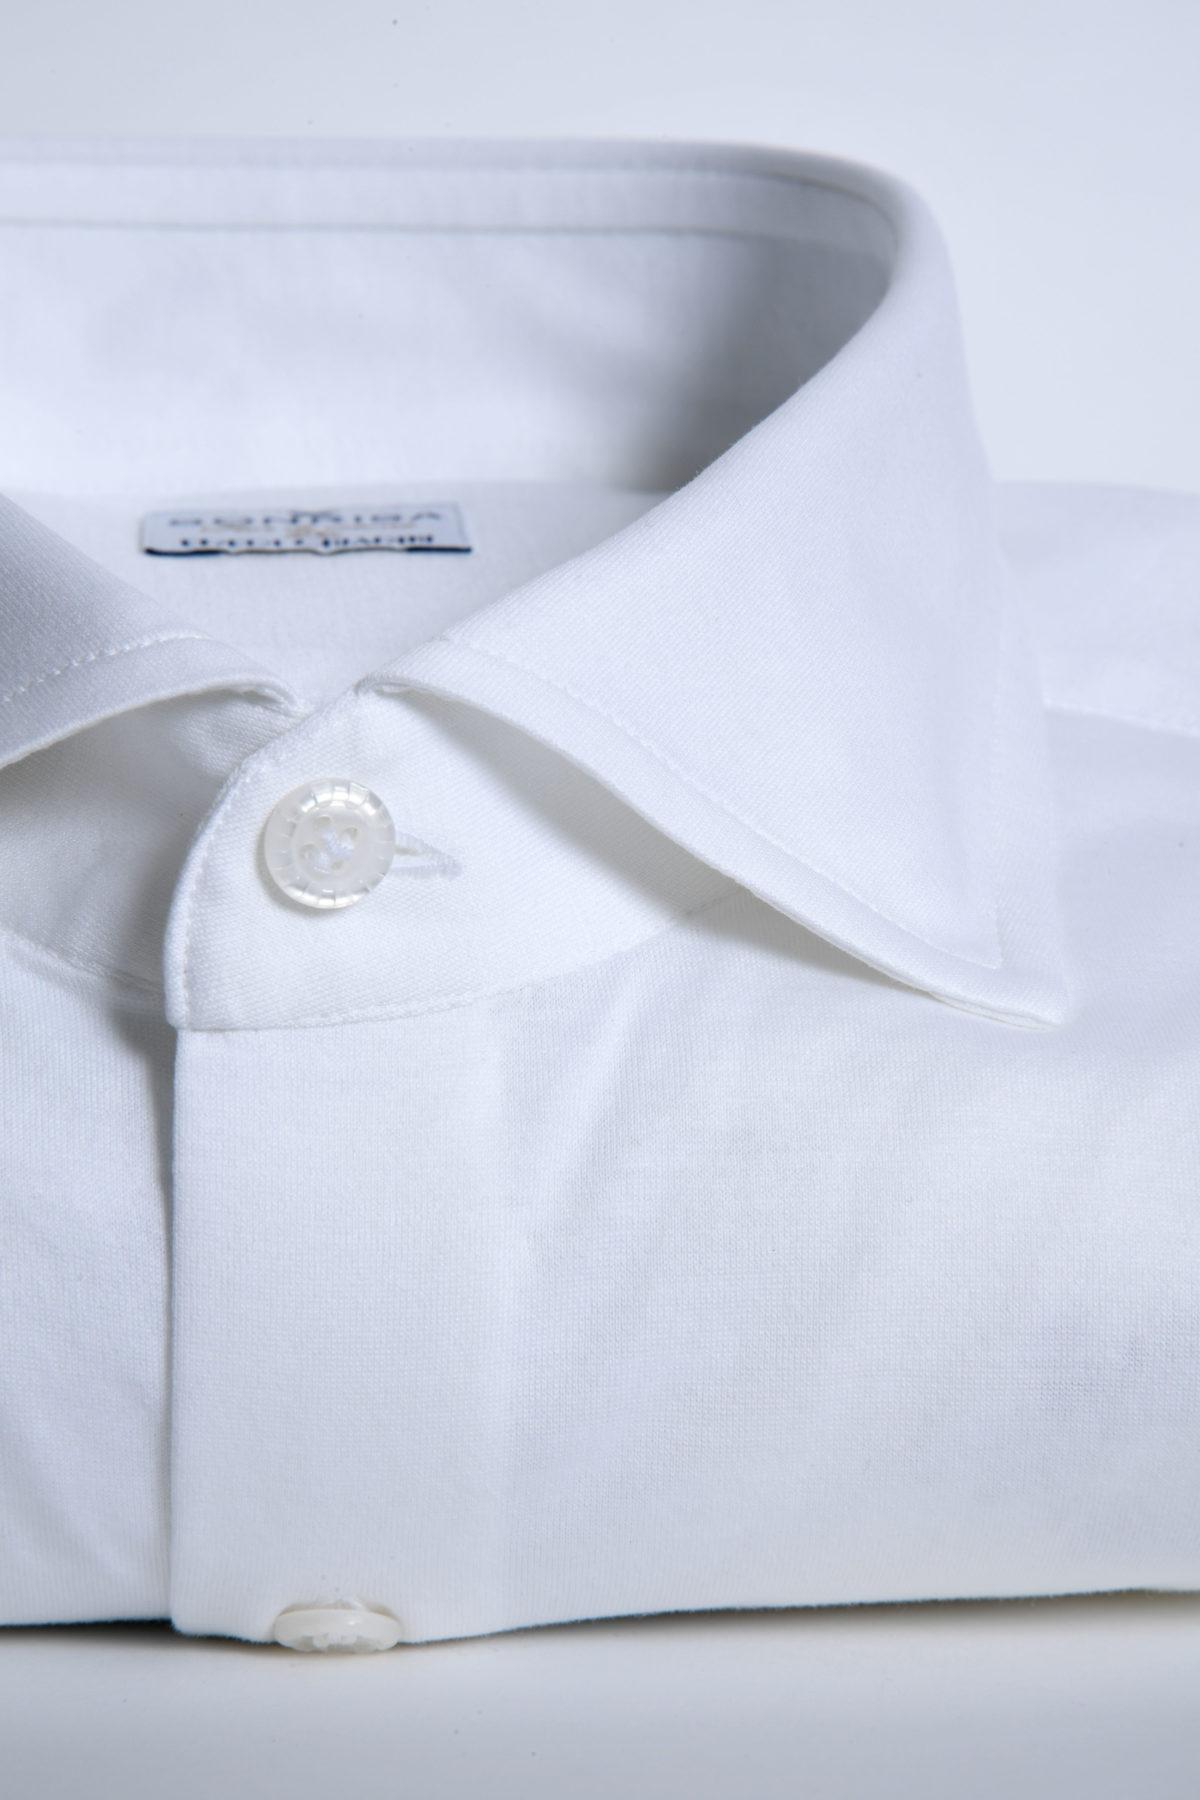 Sonrisa camicia jersey bianca